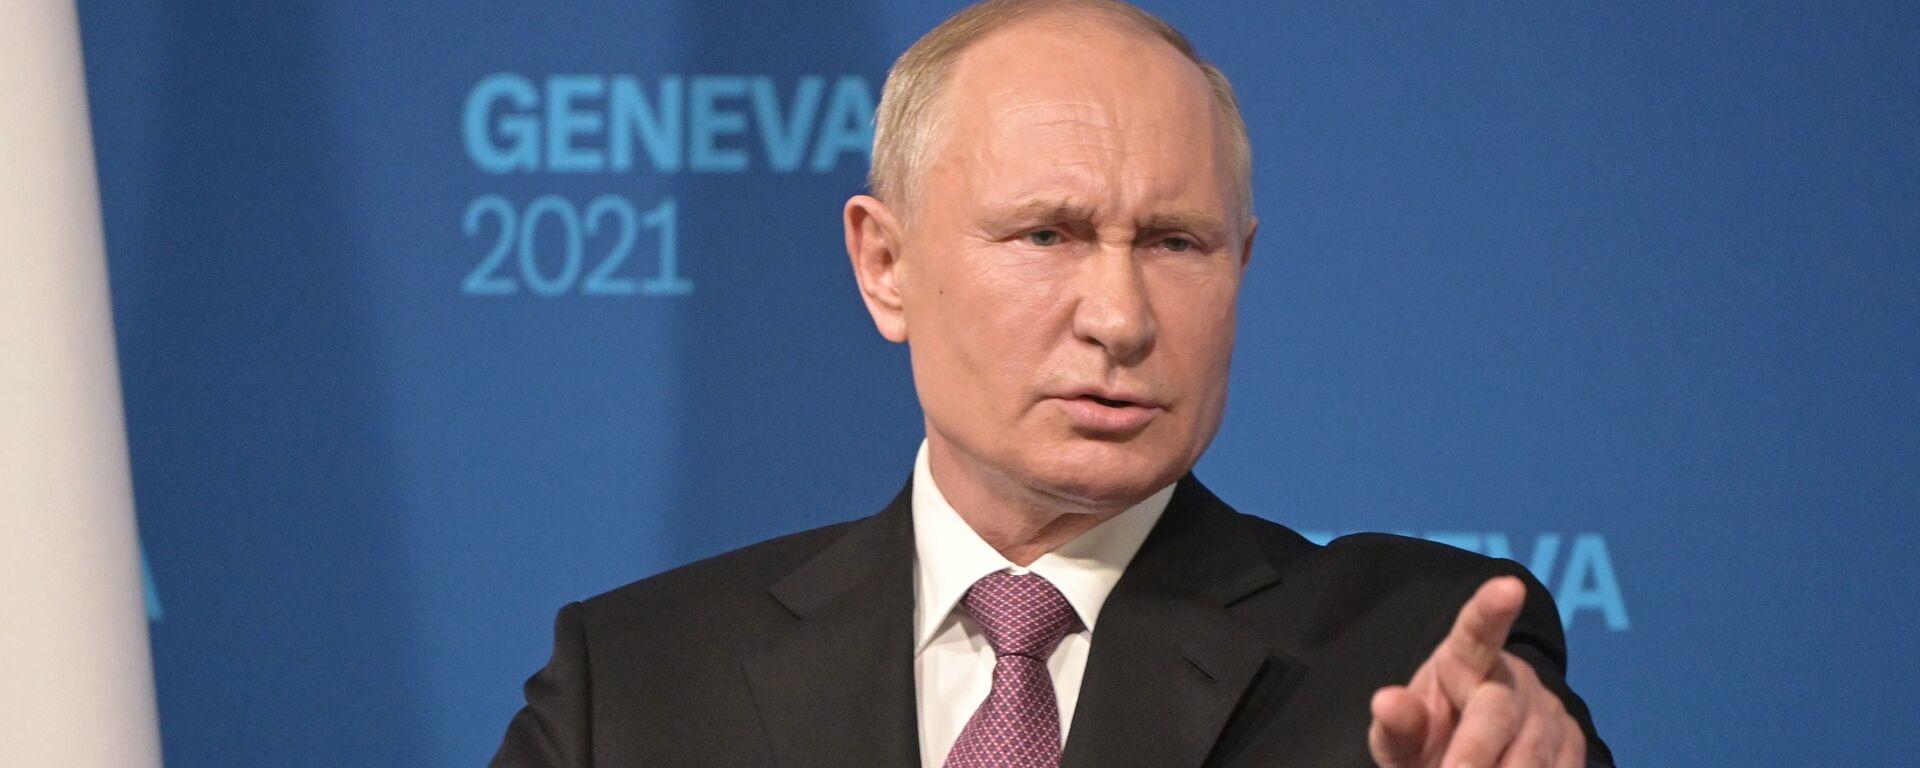 Władimir Putin - Sputnik Polska, 1920, 12.07.2021